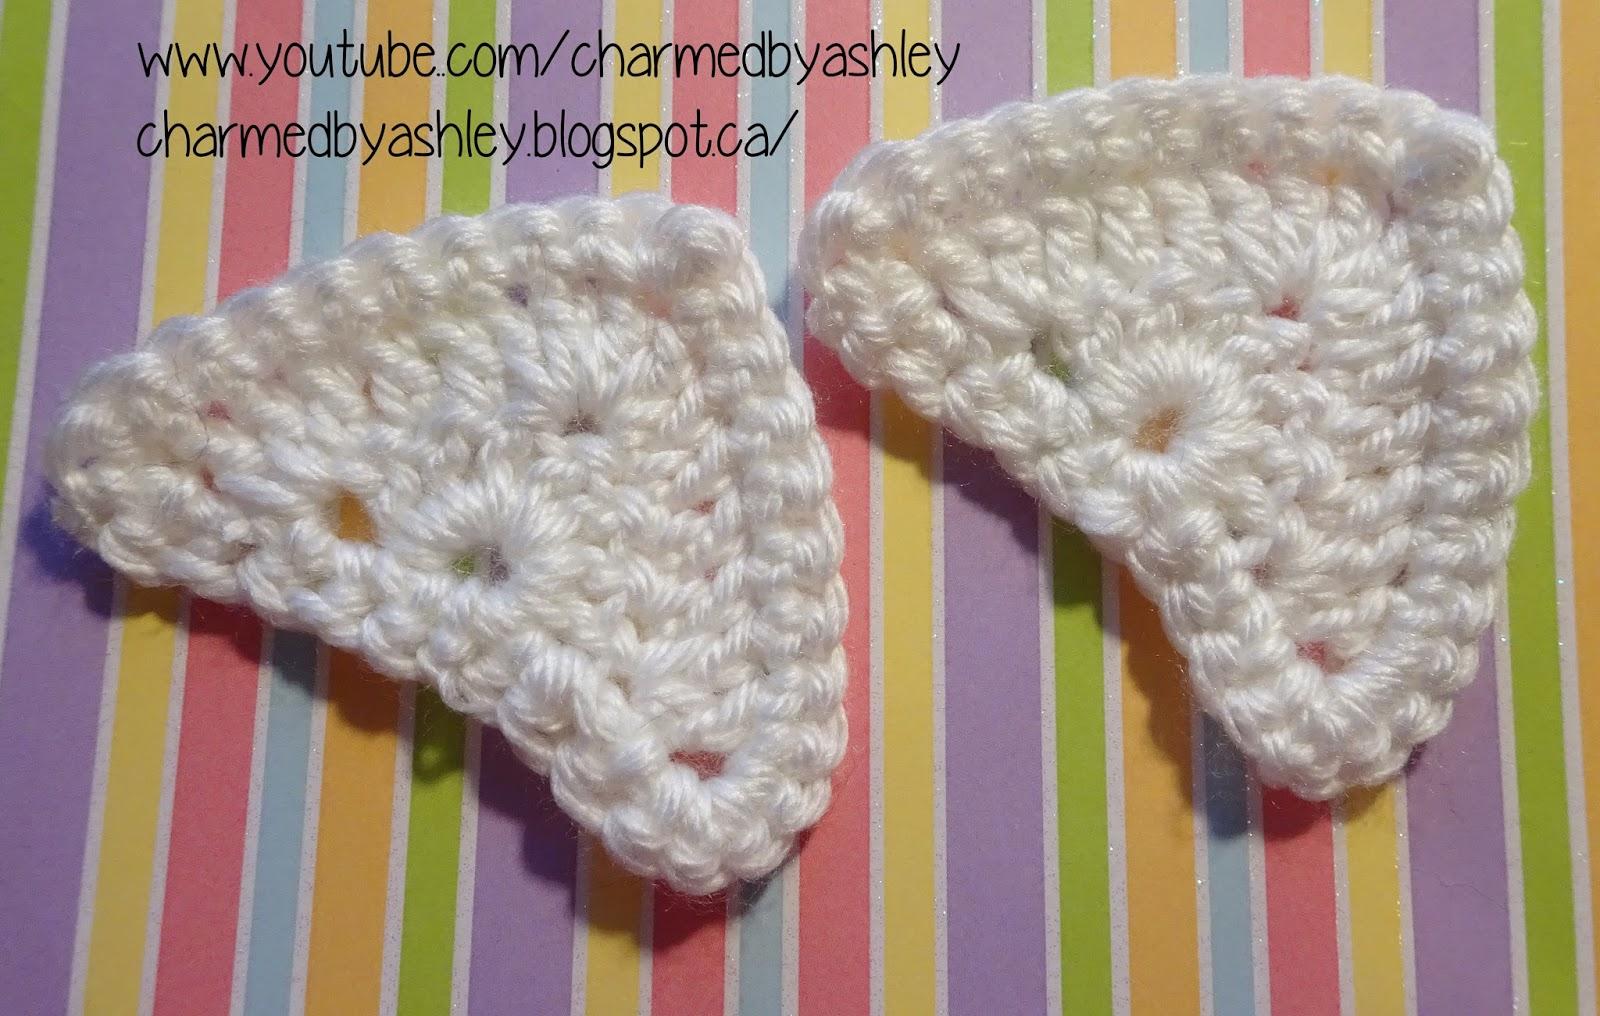 Free Crochet Pattern For Animal Ears : Cat ears Crochet Free pattern and tutorial - Charmed By Ashley